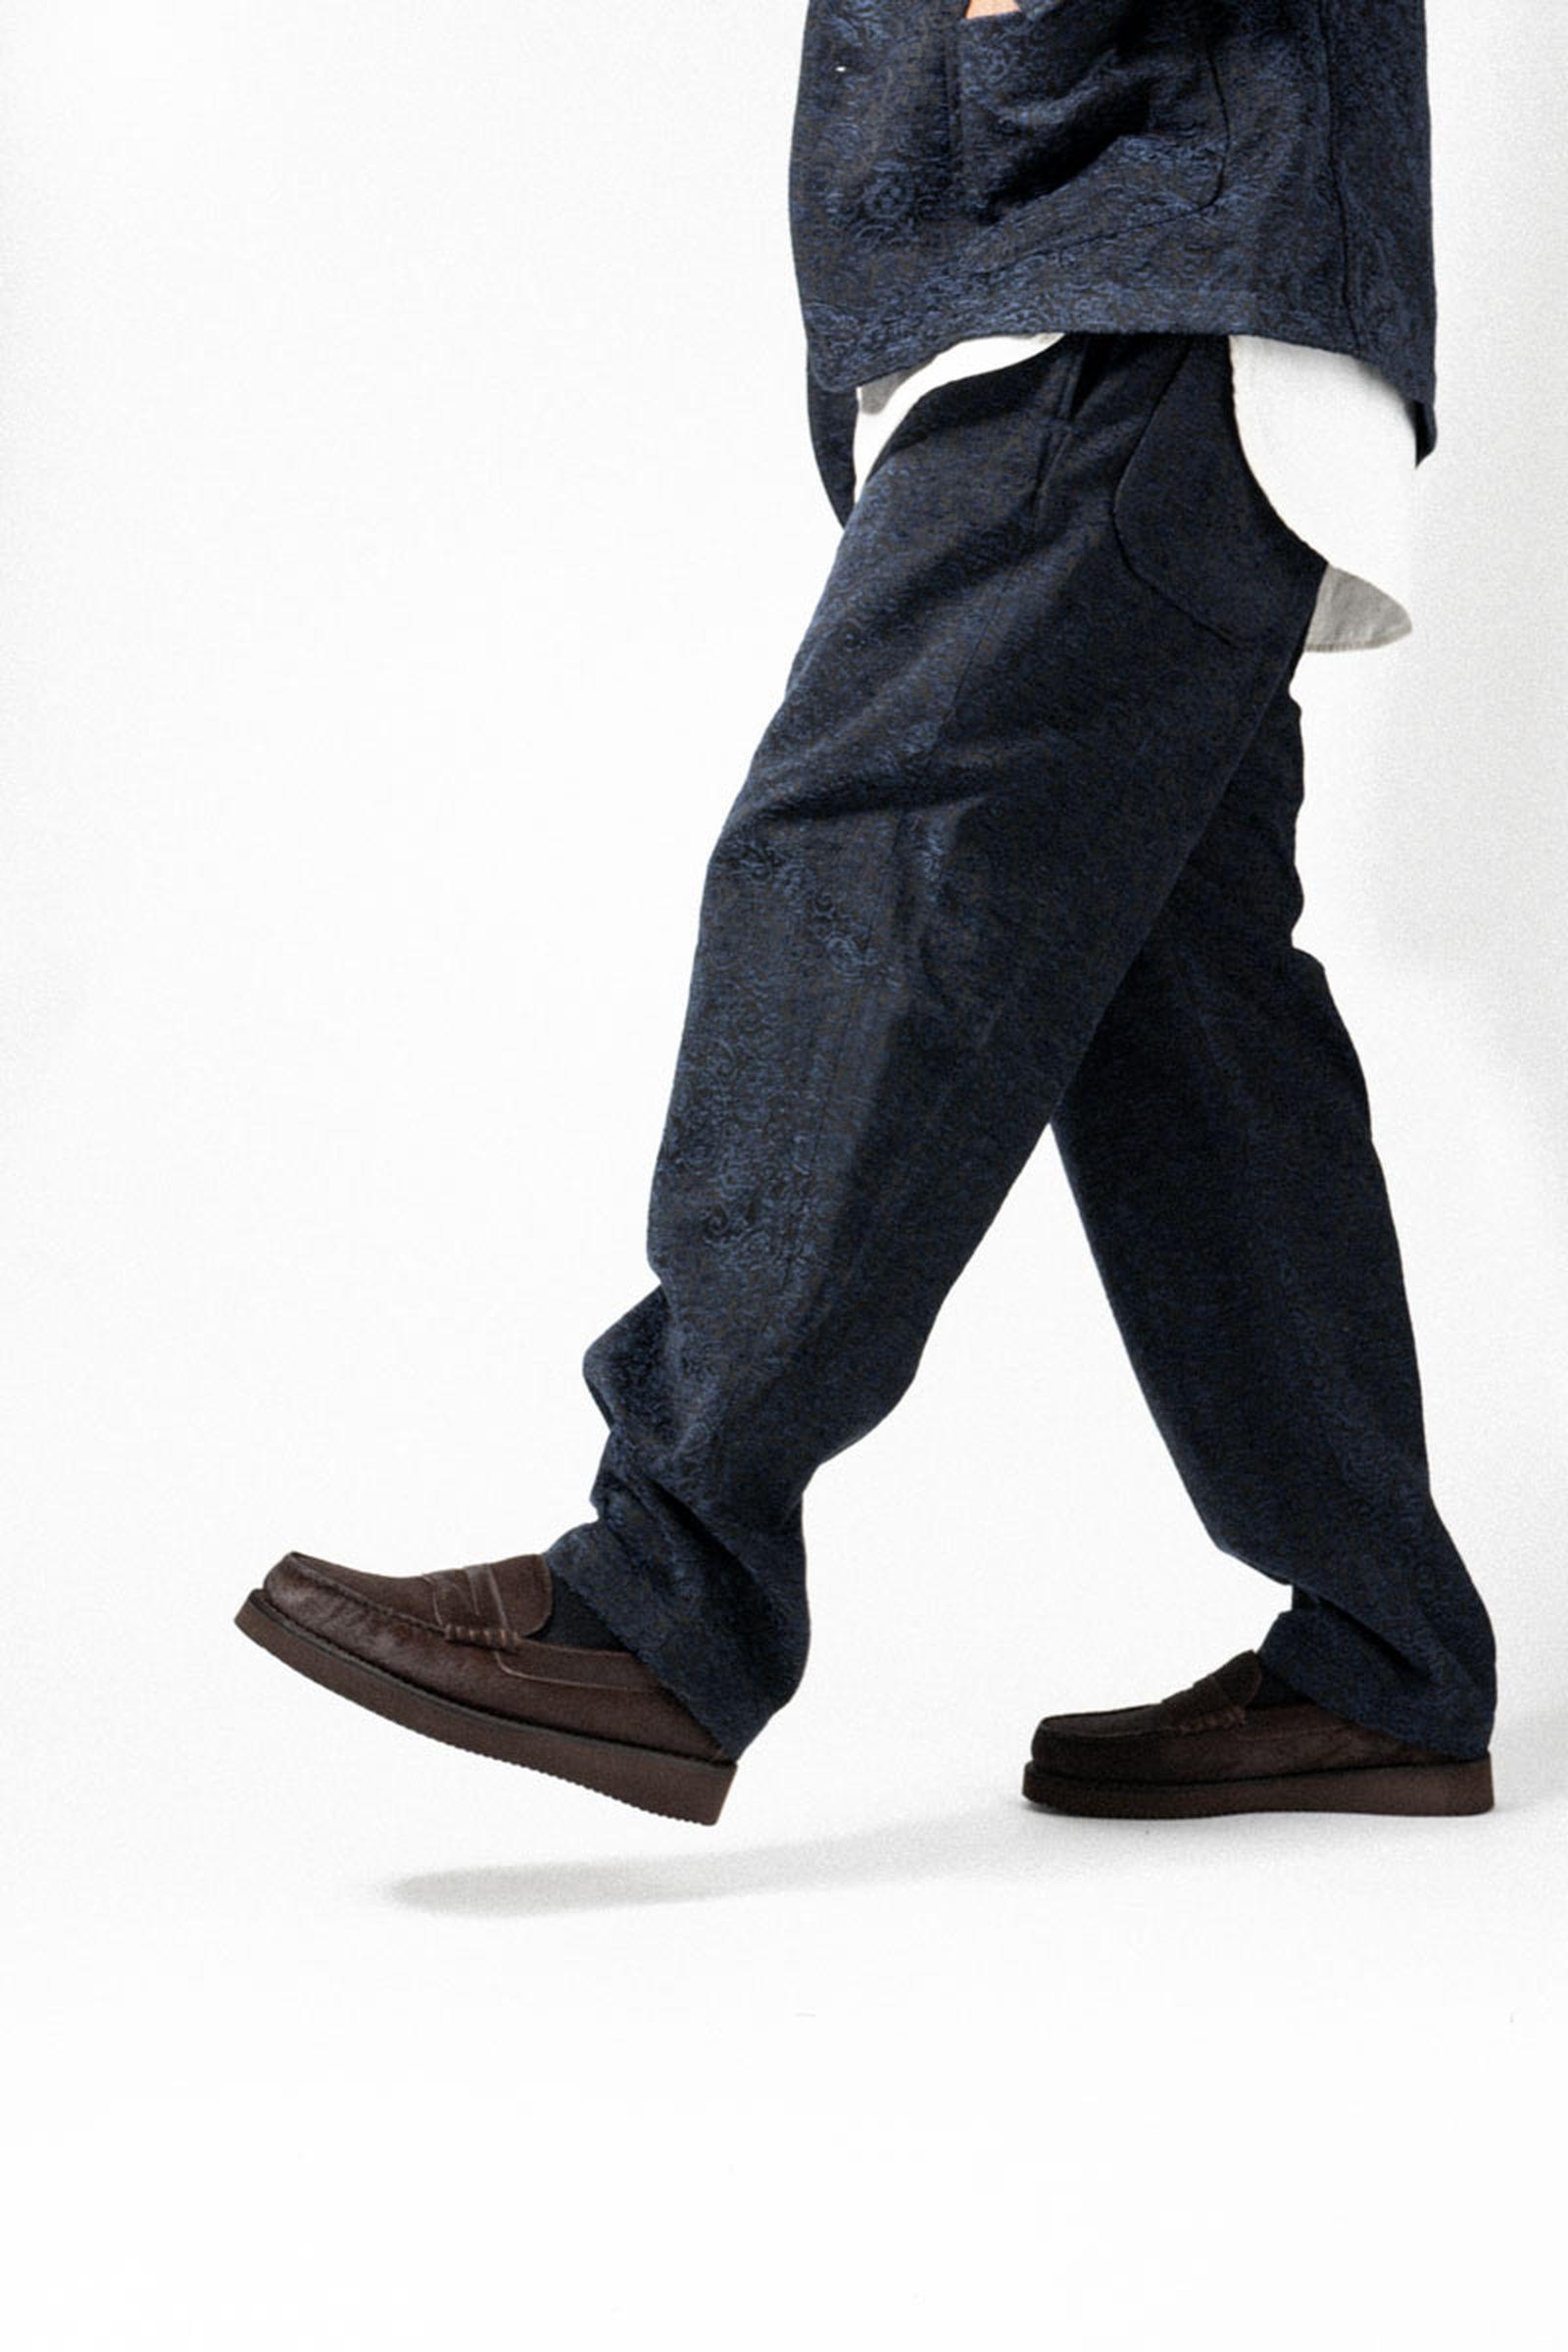 engineered-garments-sebago-fw21-release-info-11